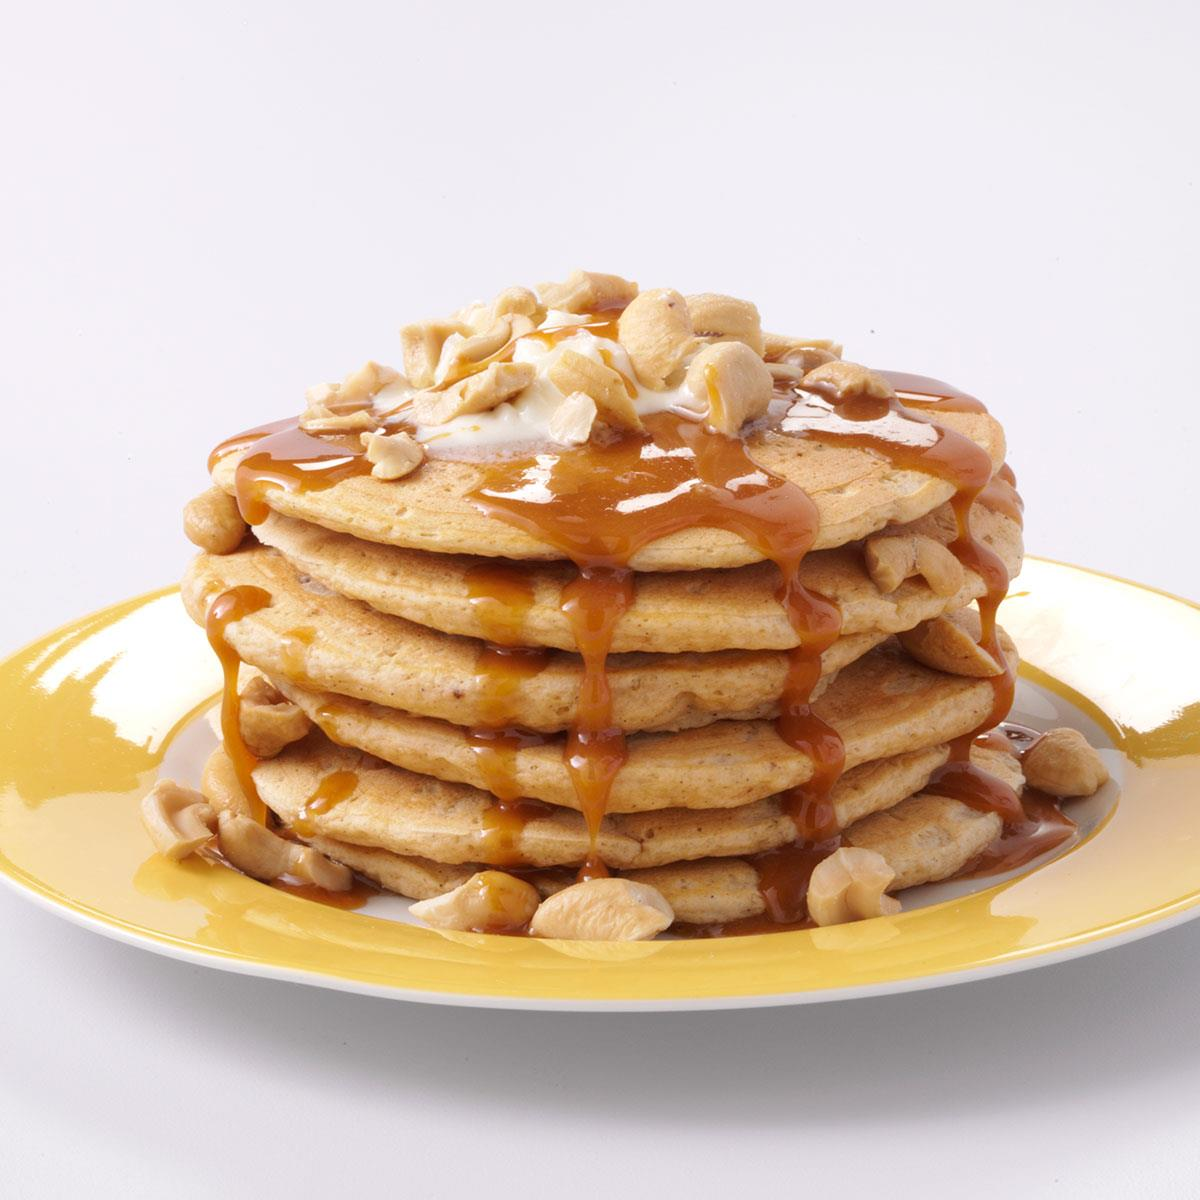 Sweet potato pancakes with caramel sauce recipe taste of home ccuart Gallery